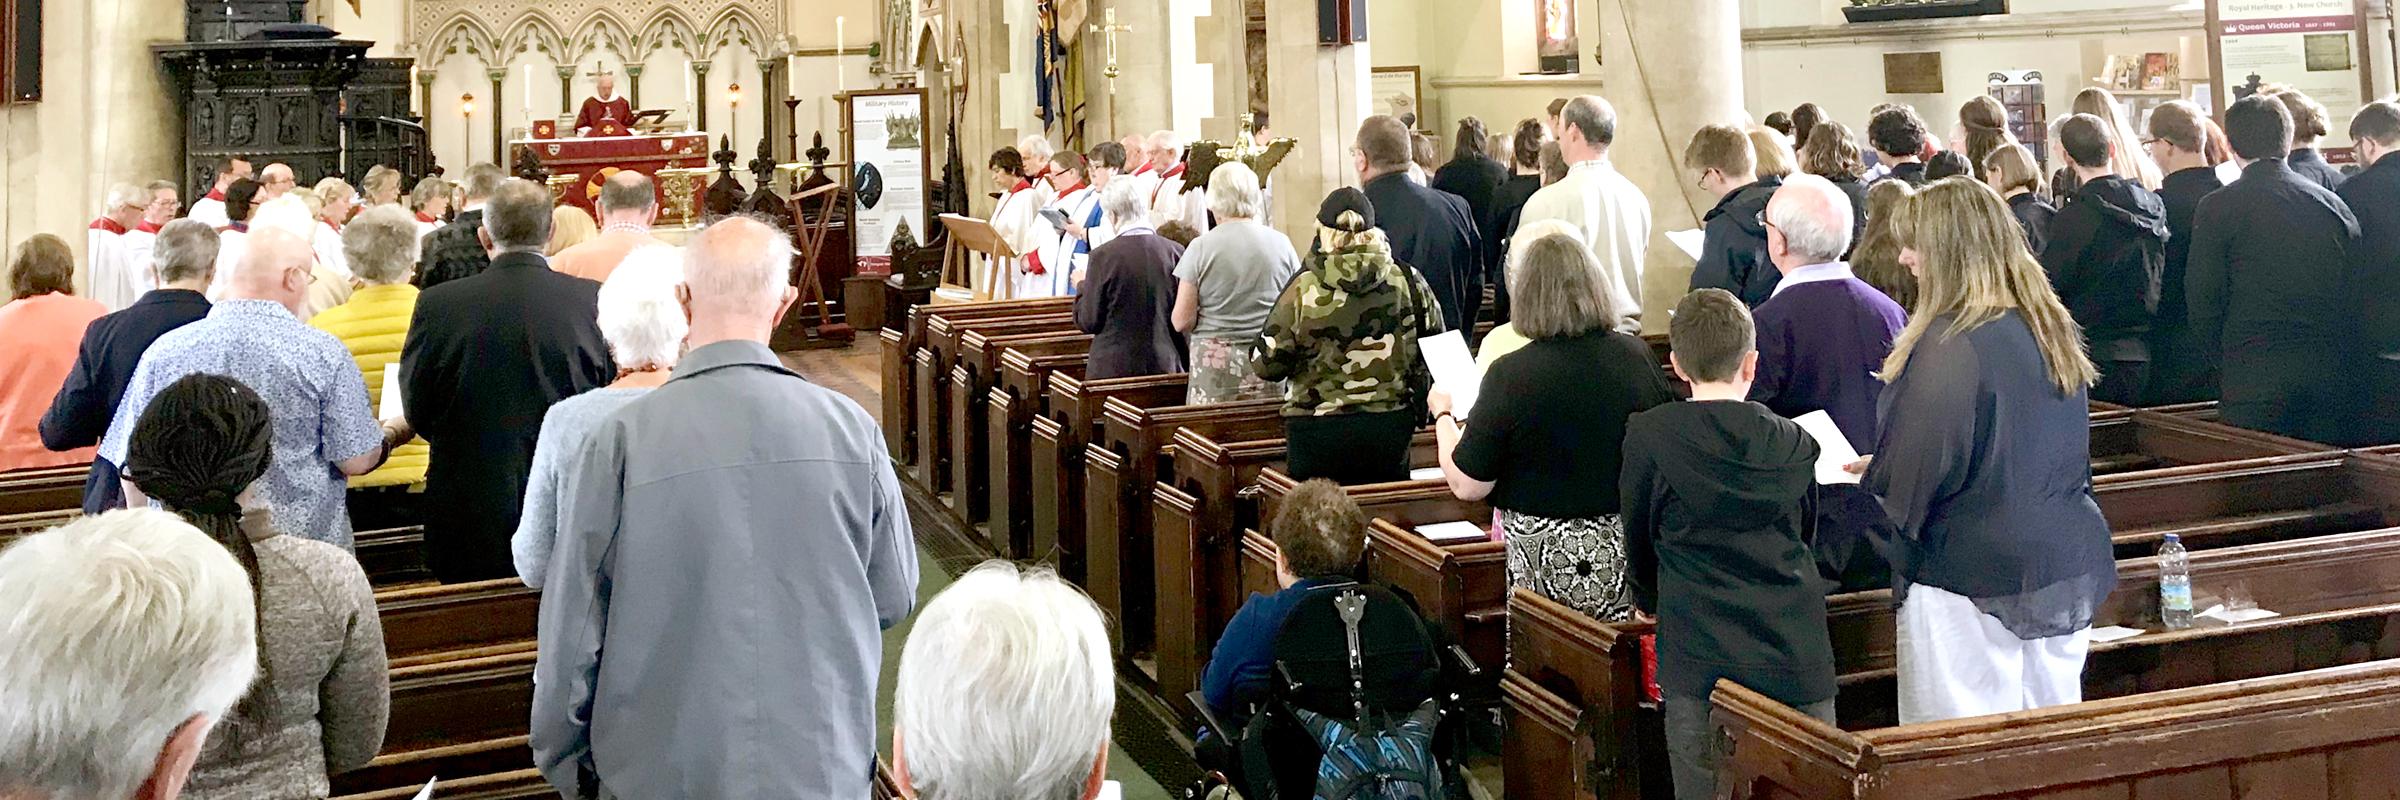 Sunday morning worship (Photo Credit: James Bremridge)